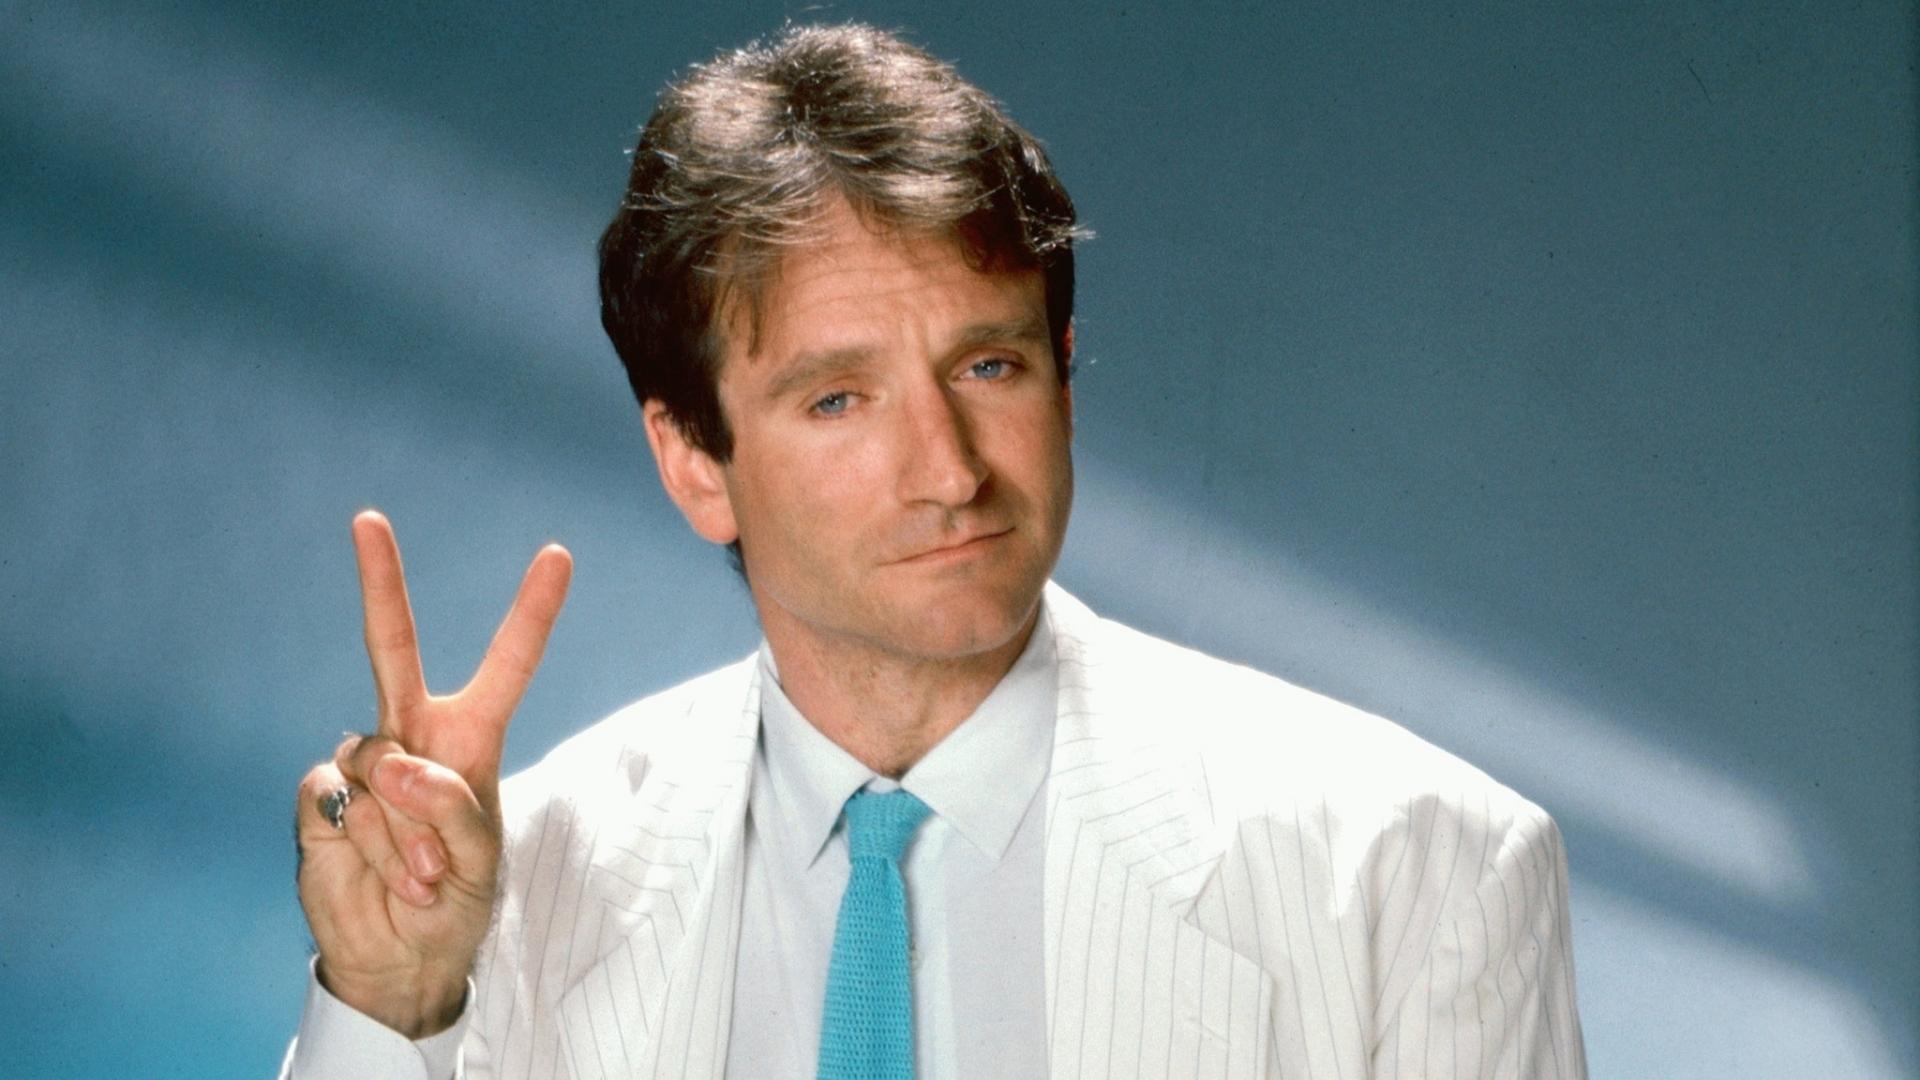 Jó utat, Robin!